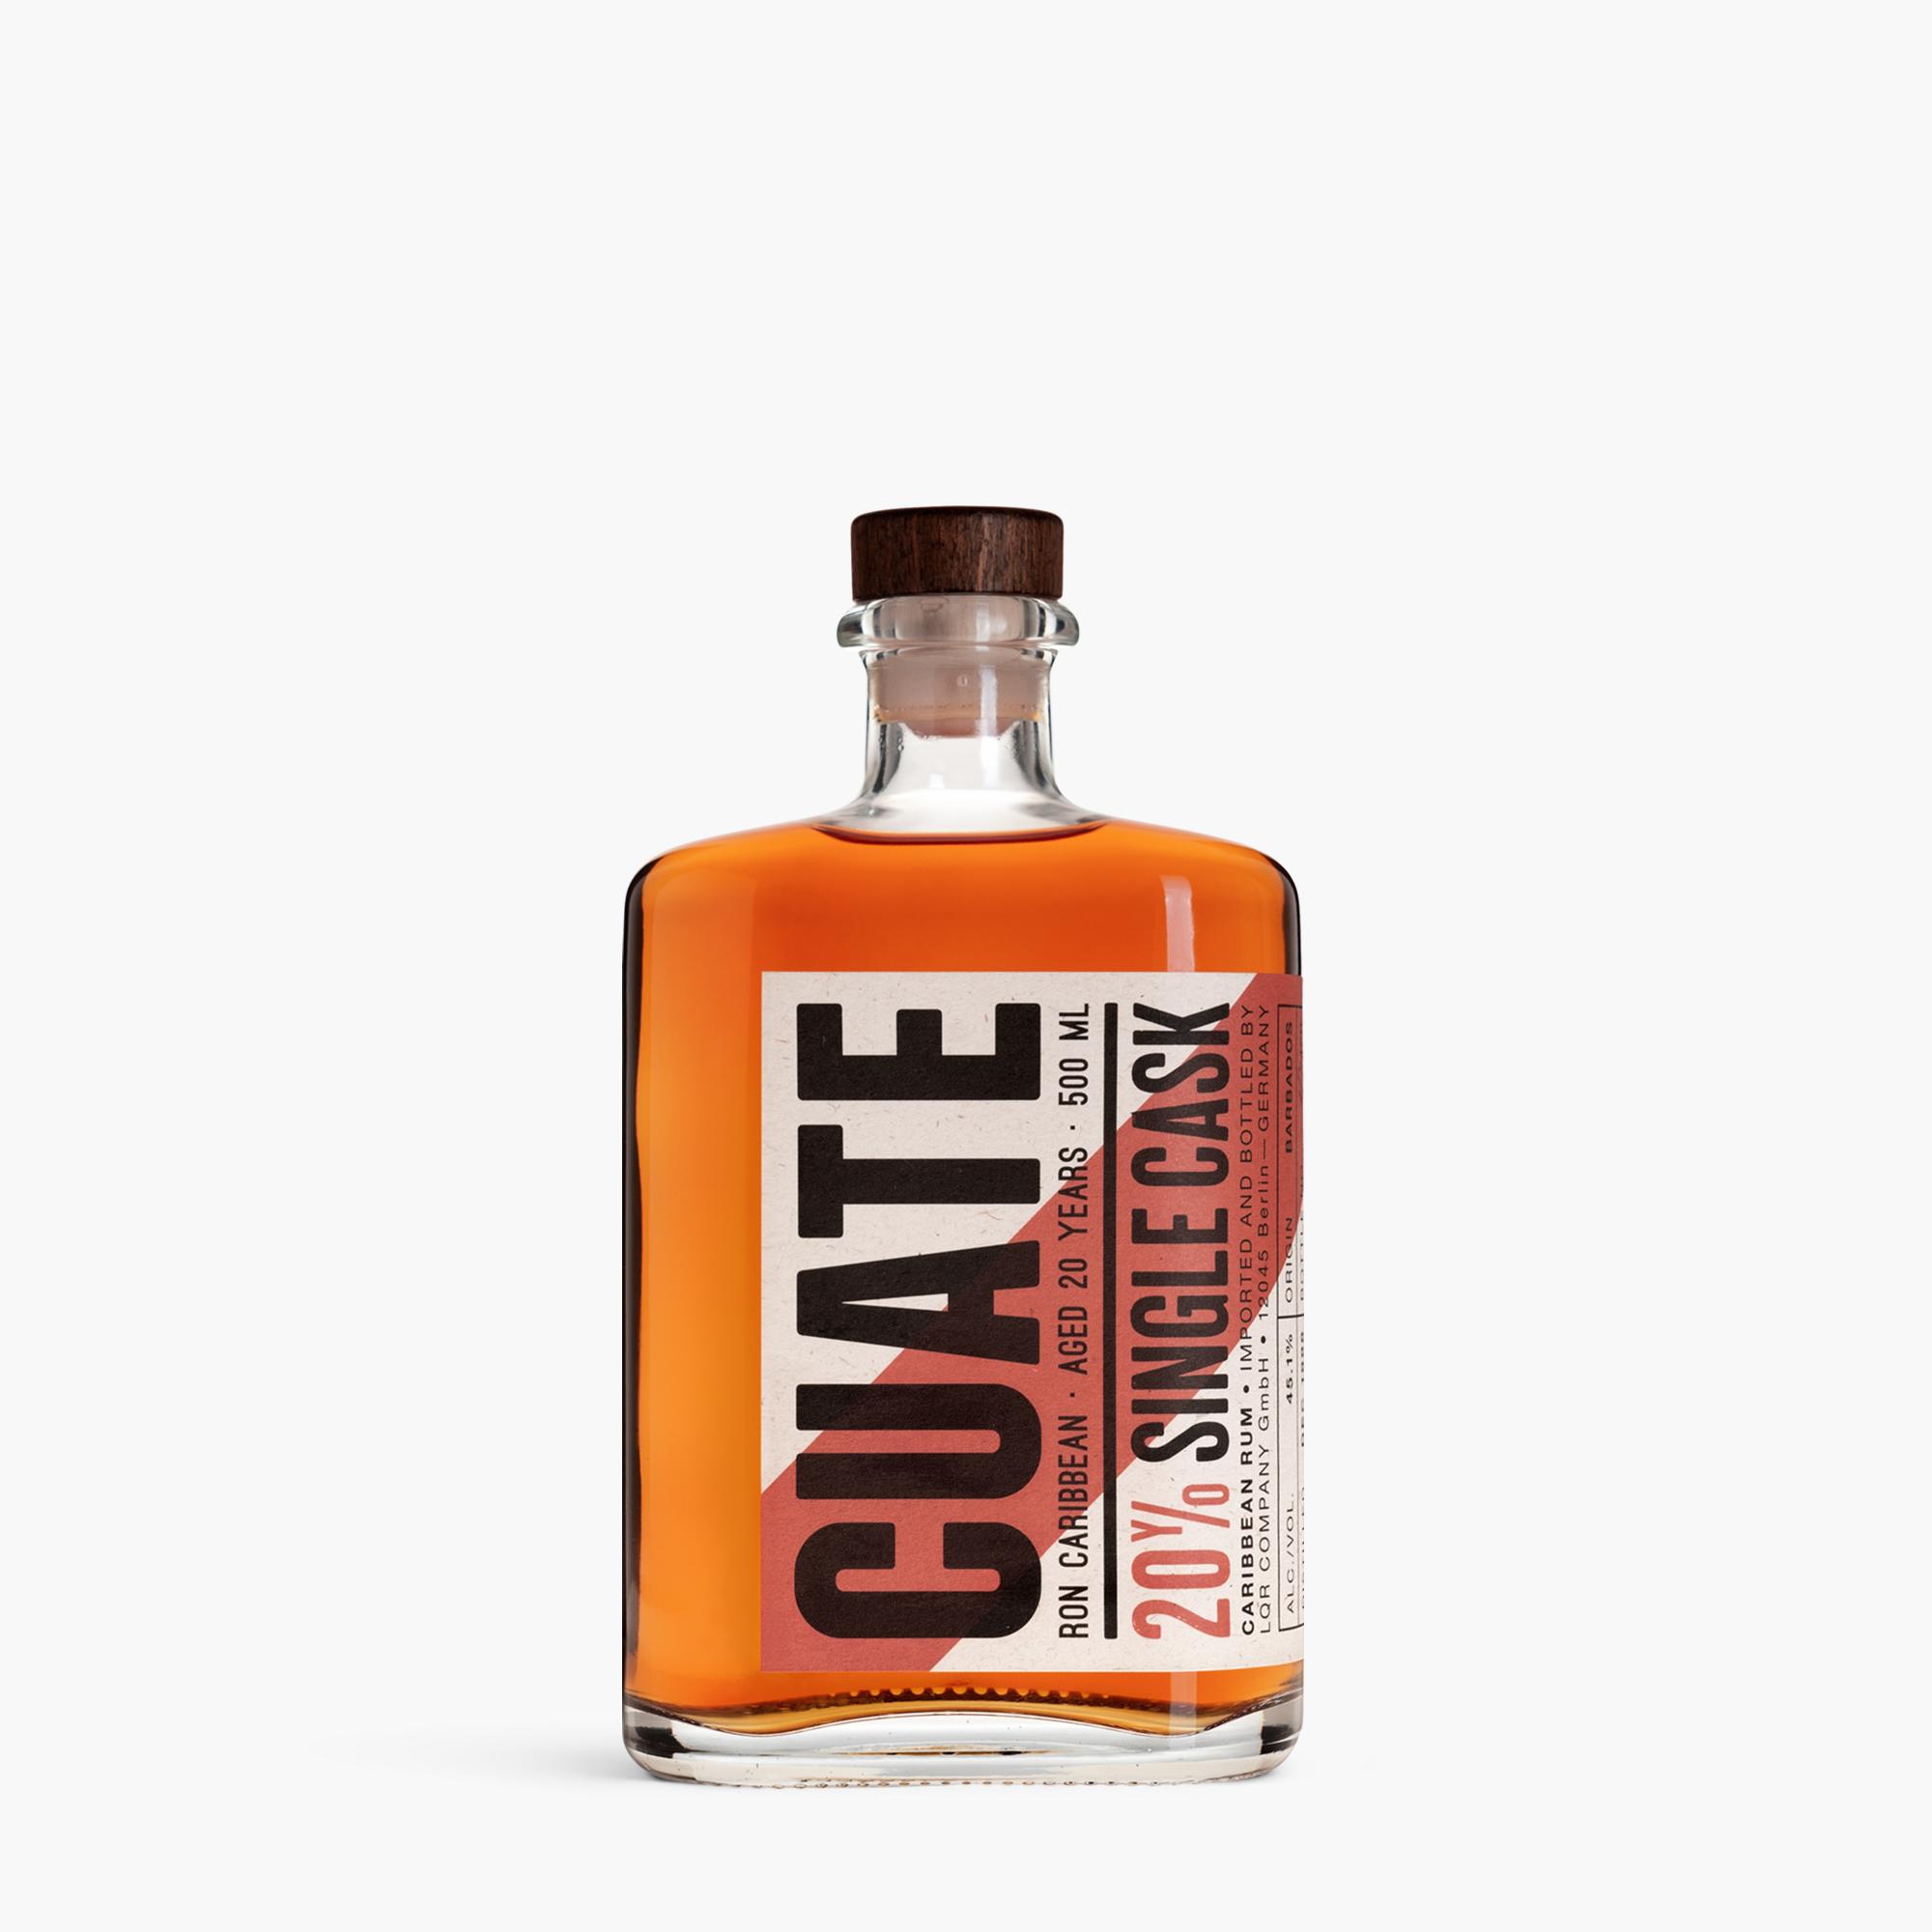 Cuate Rum Single Cask